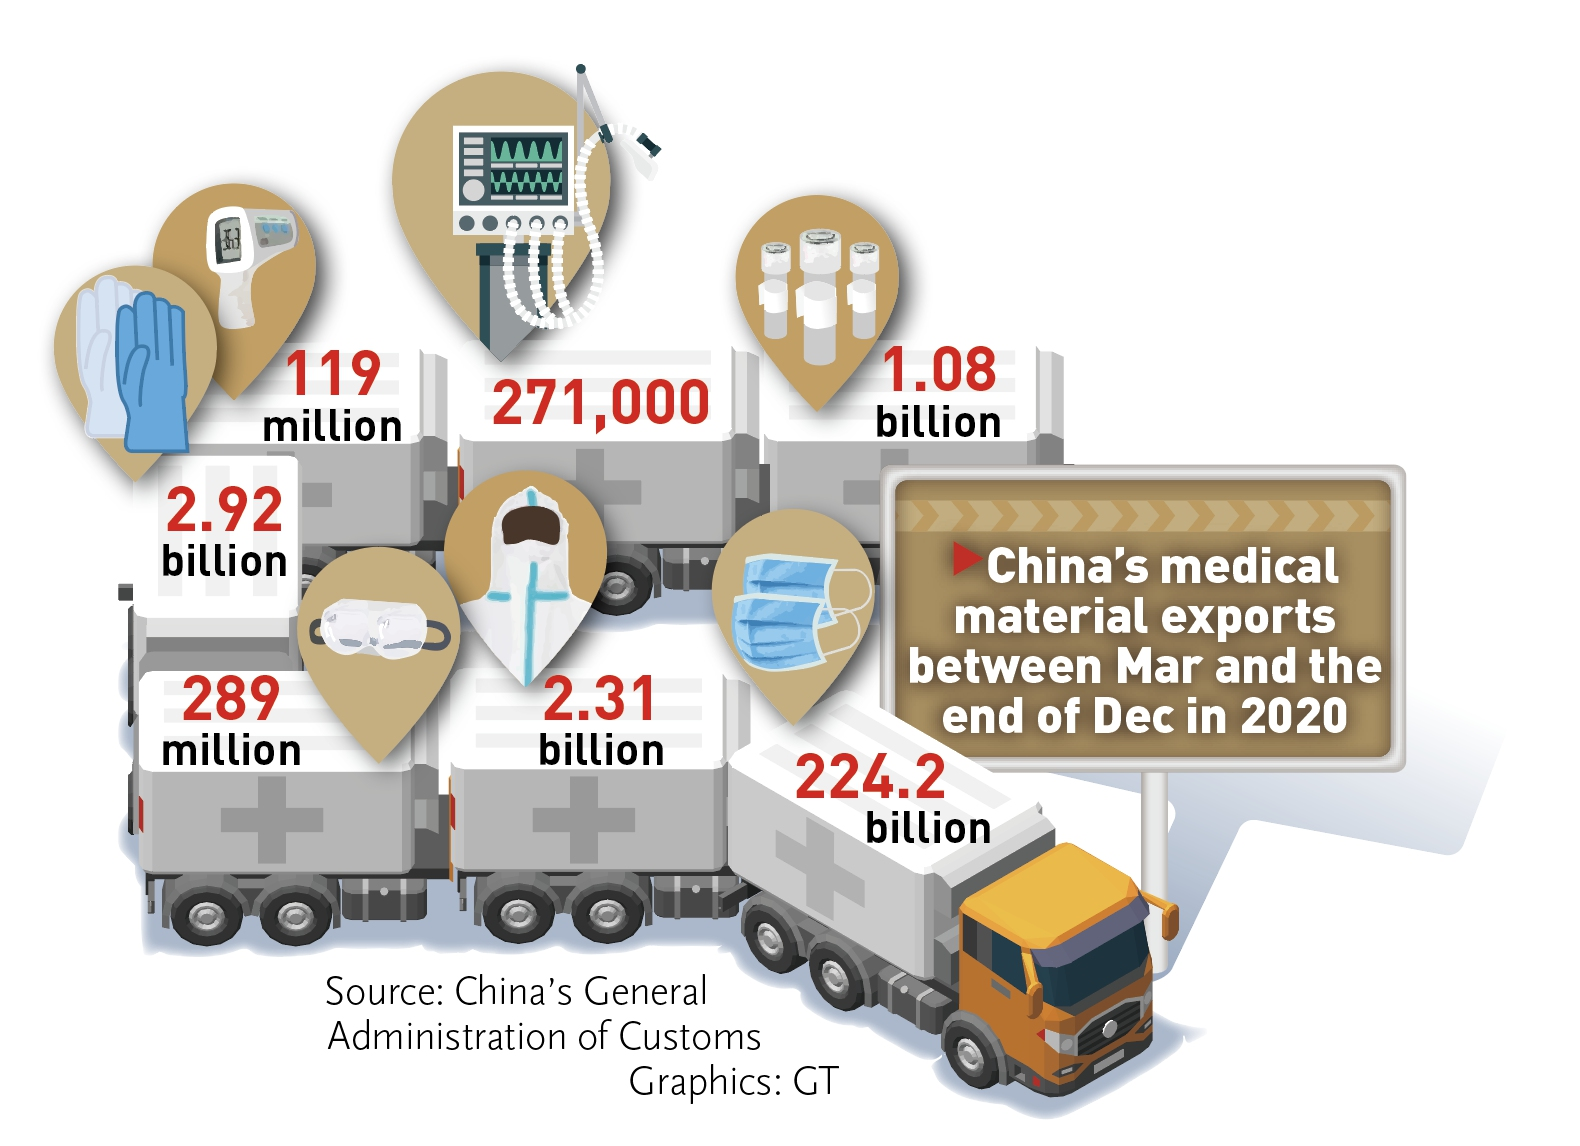 BRI обеспечивает рост и защиту в условиях пандемии Инфографика